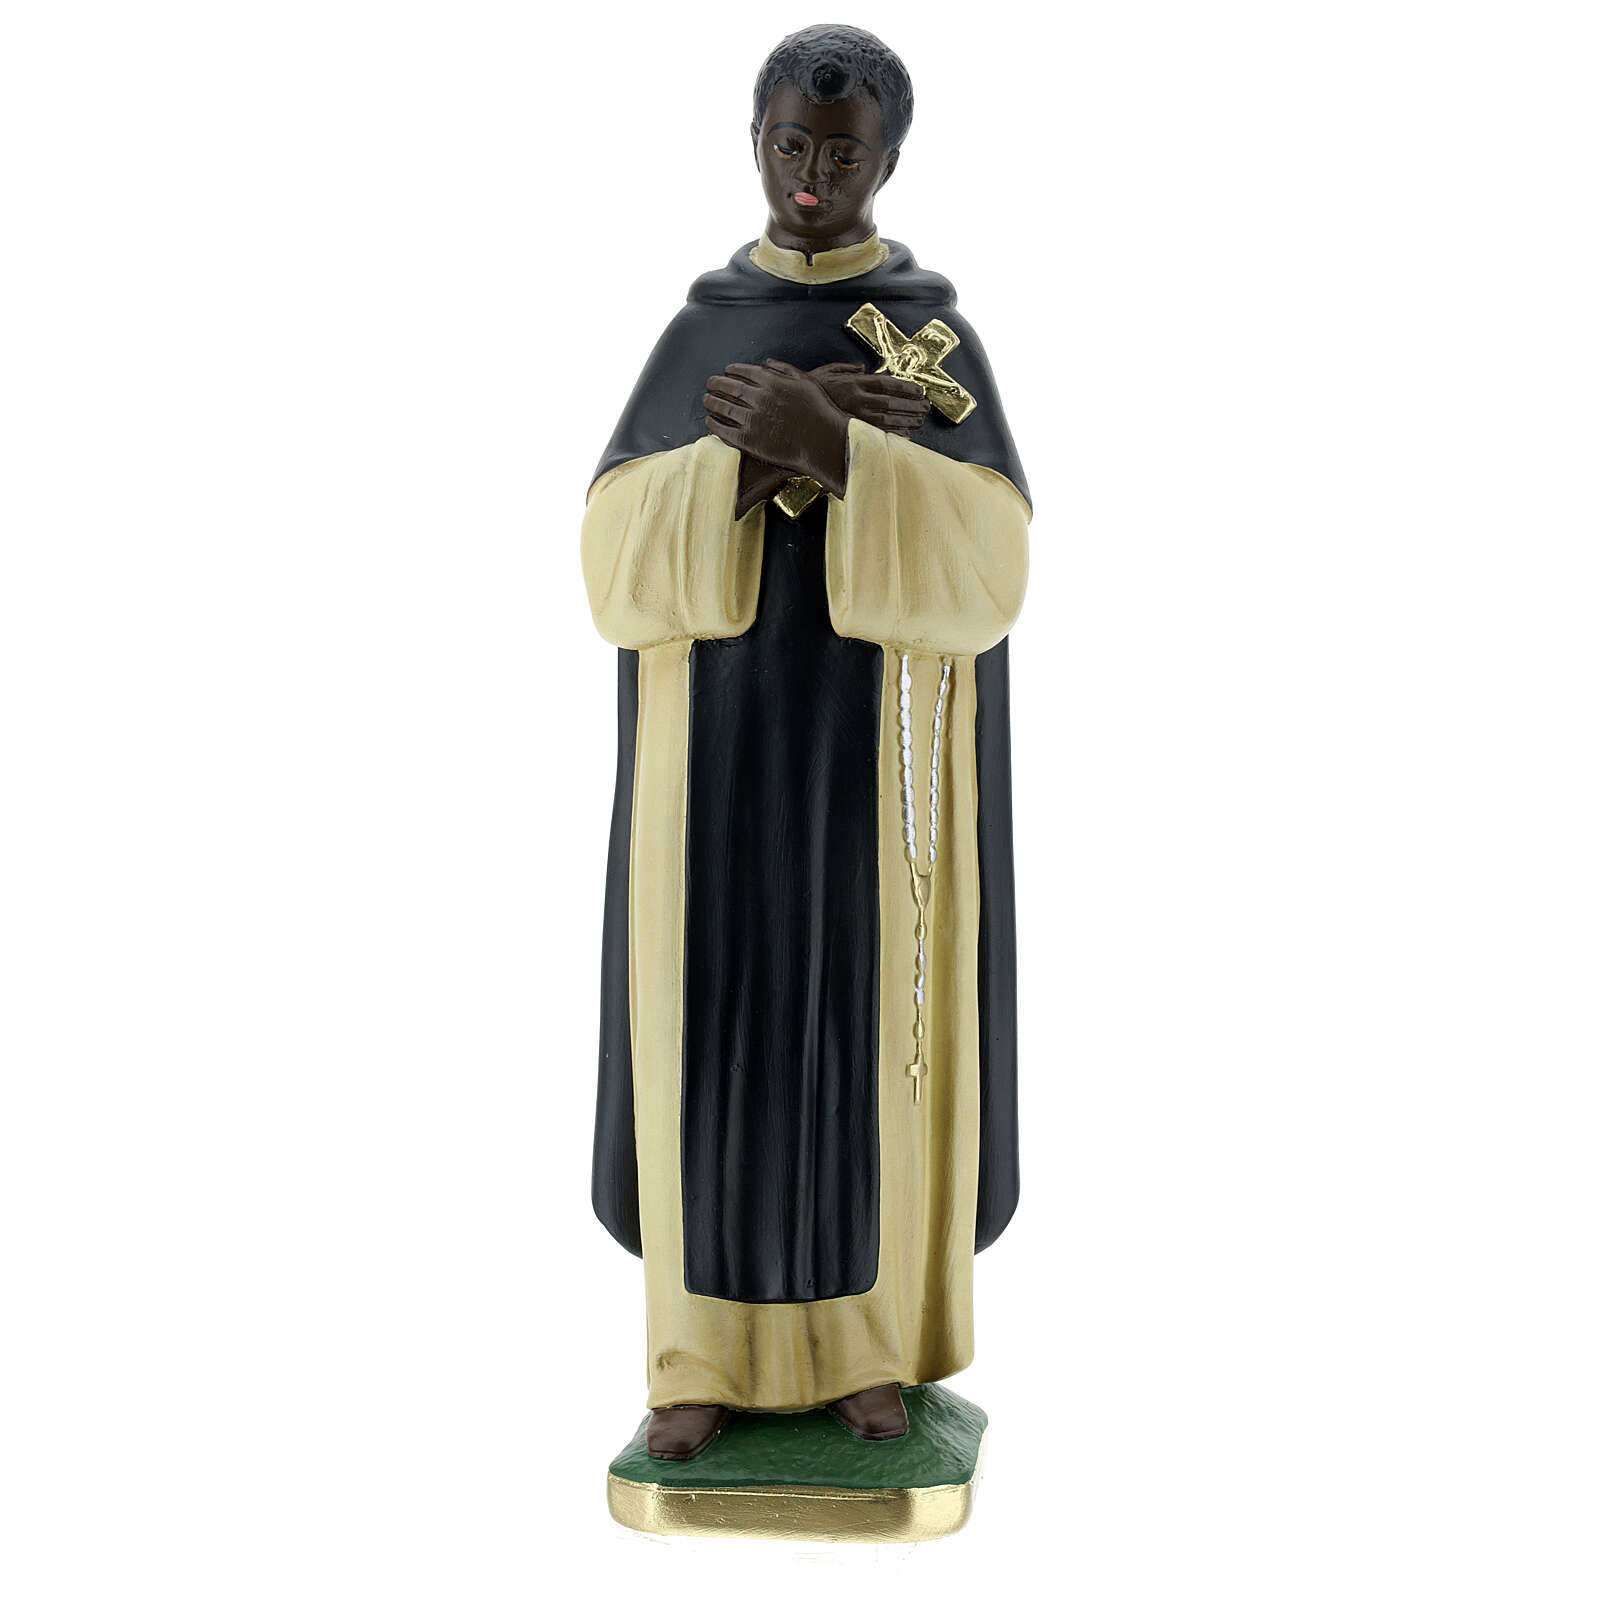 Statuette Saint Martin de Porrès 30 cm plâtre peint main Barsanti 4